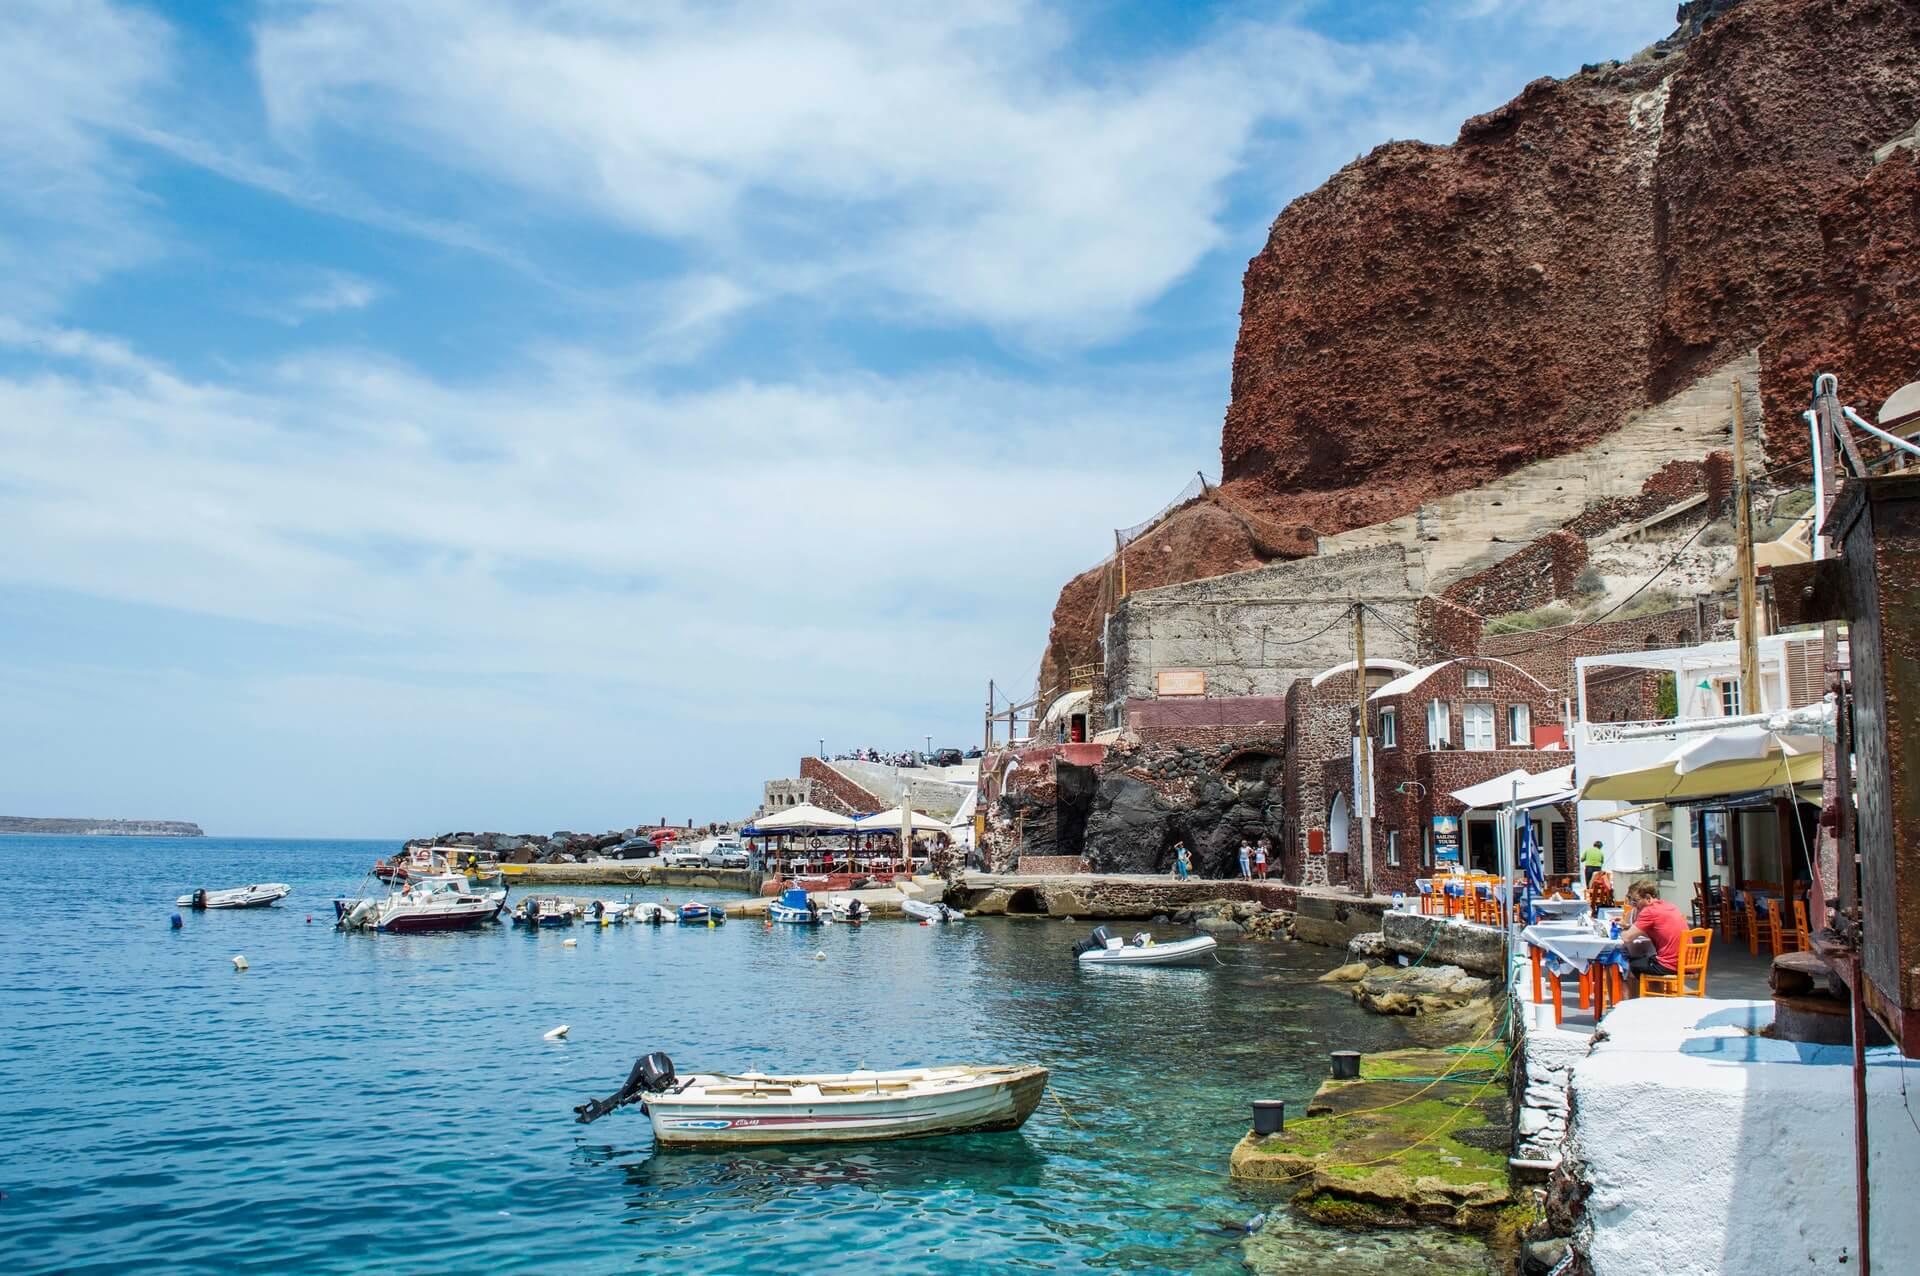 Six Fantastic Restaurants To Try In Santorini - Ferryscanner.com